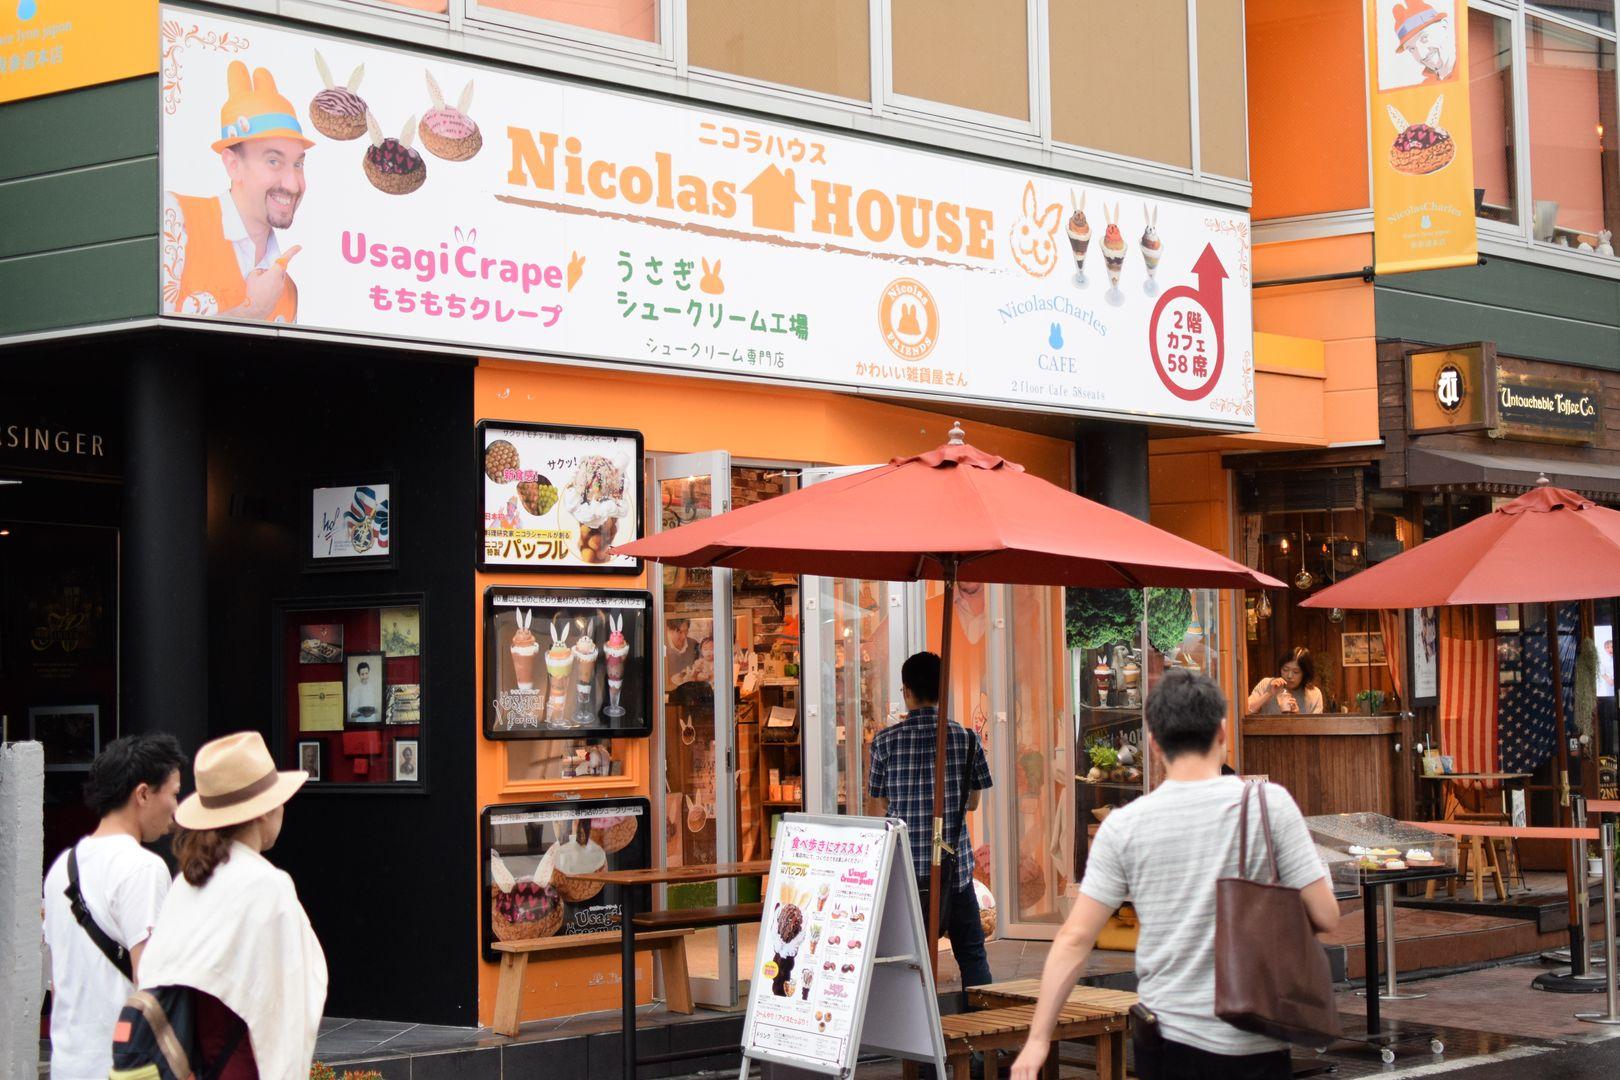 Bunny Café Nicolas Charles House